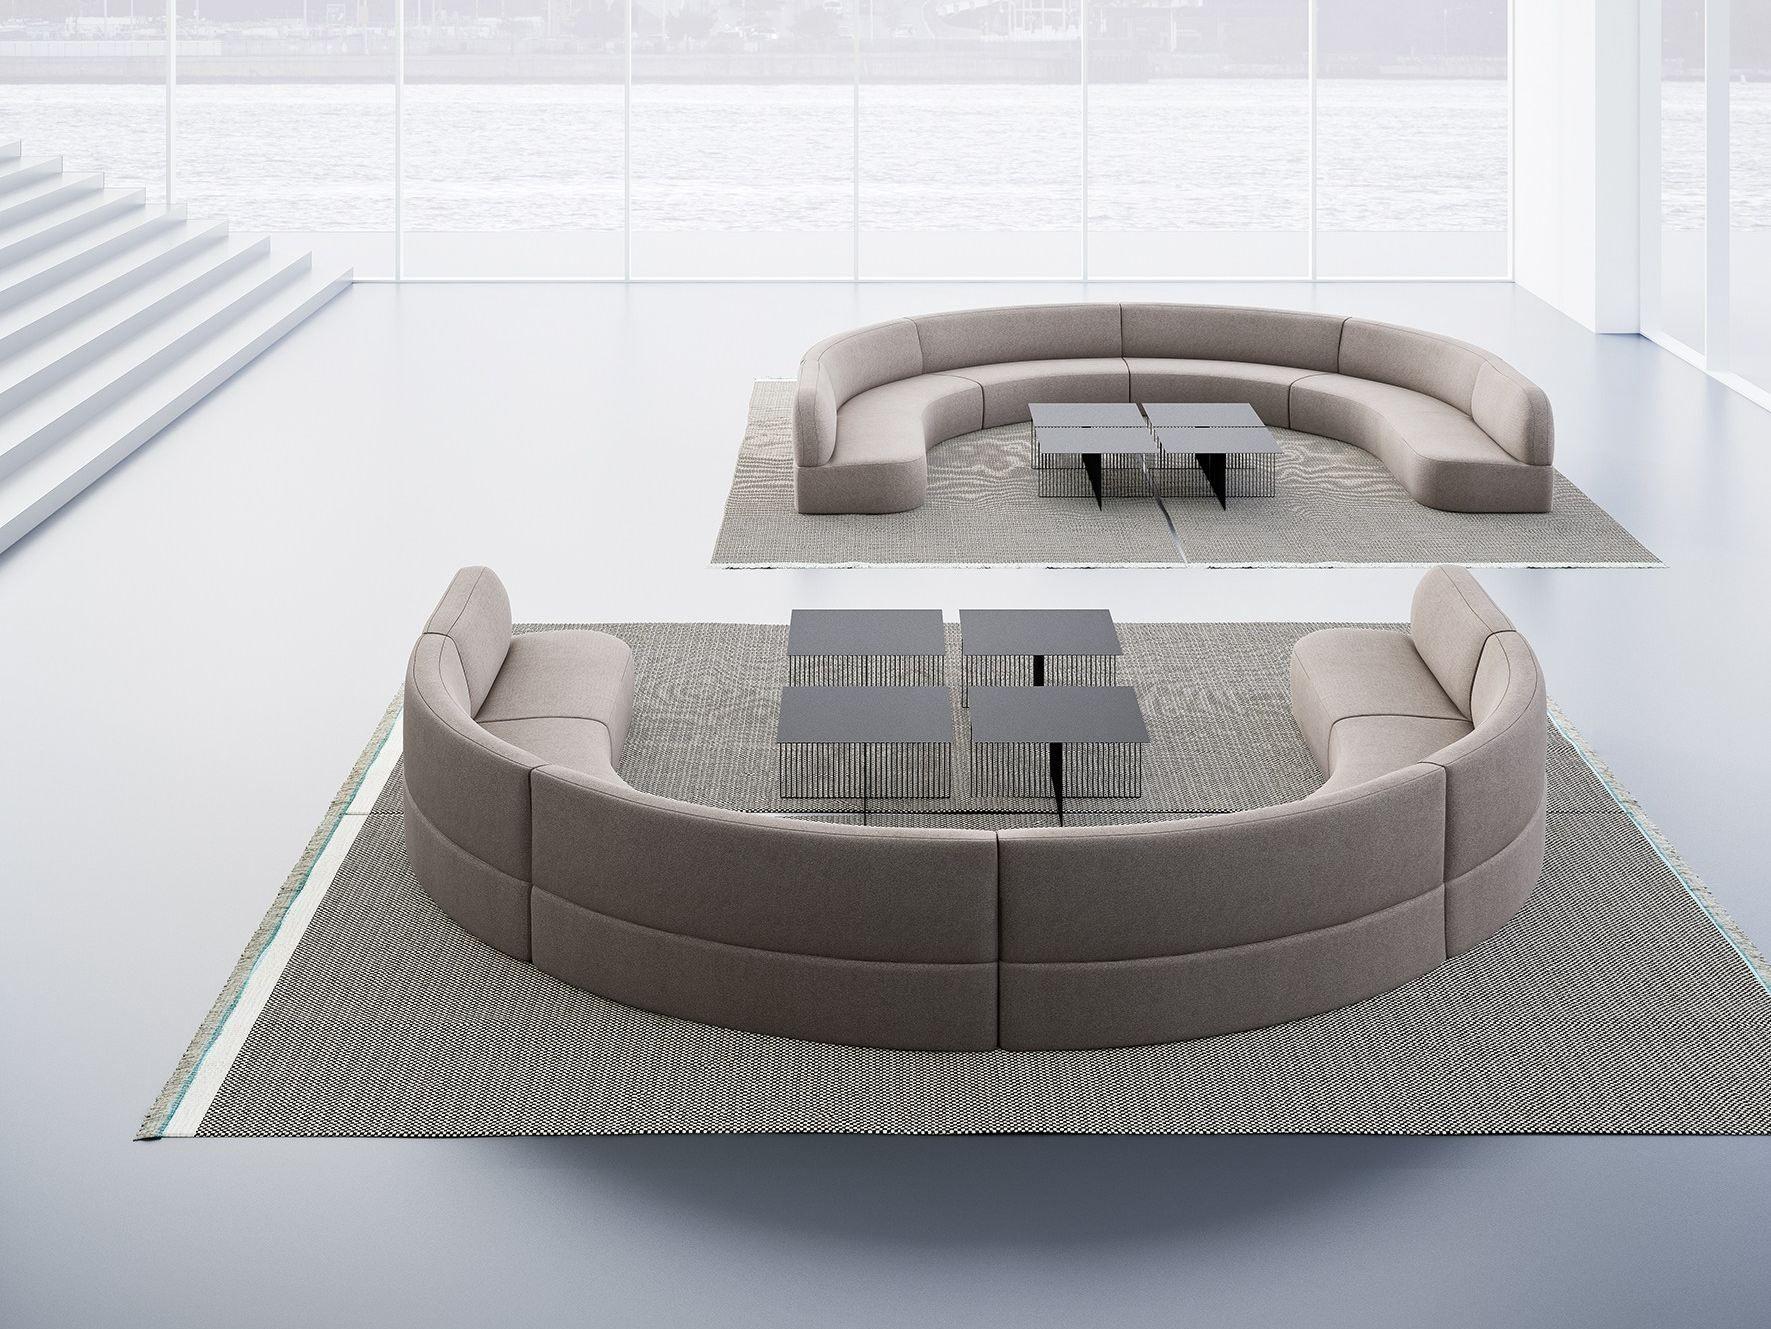 guest round sofa by la cividina design antonio rodriguez. Black Bedroom Furniture Sets. Home Design Ideas